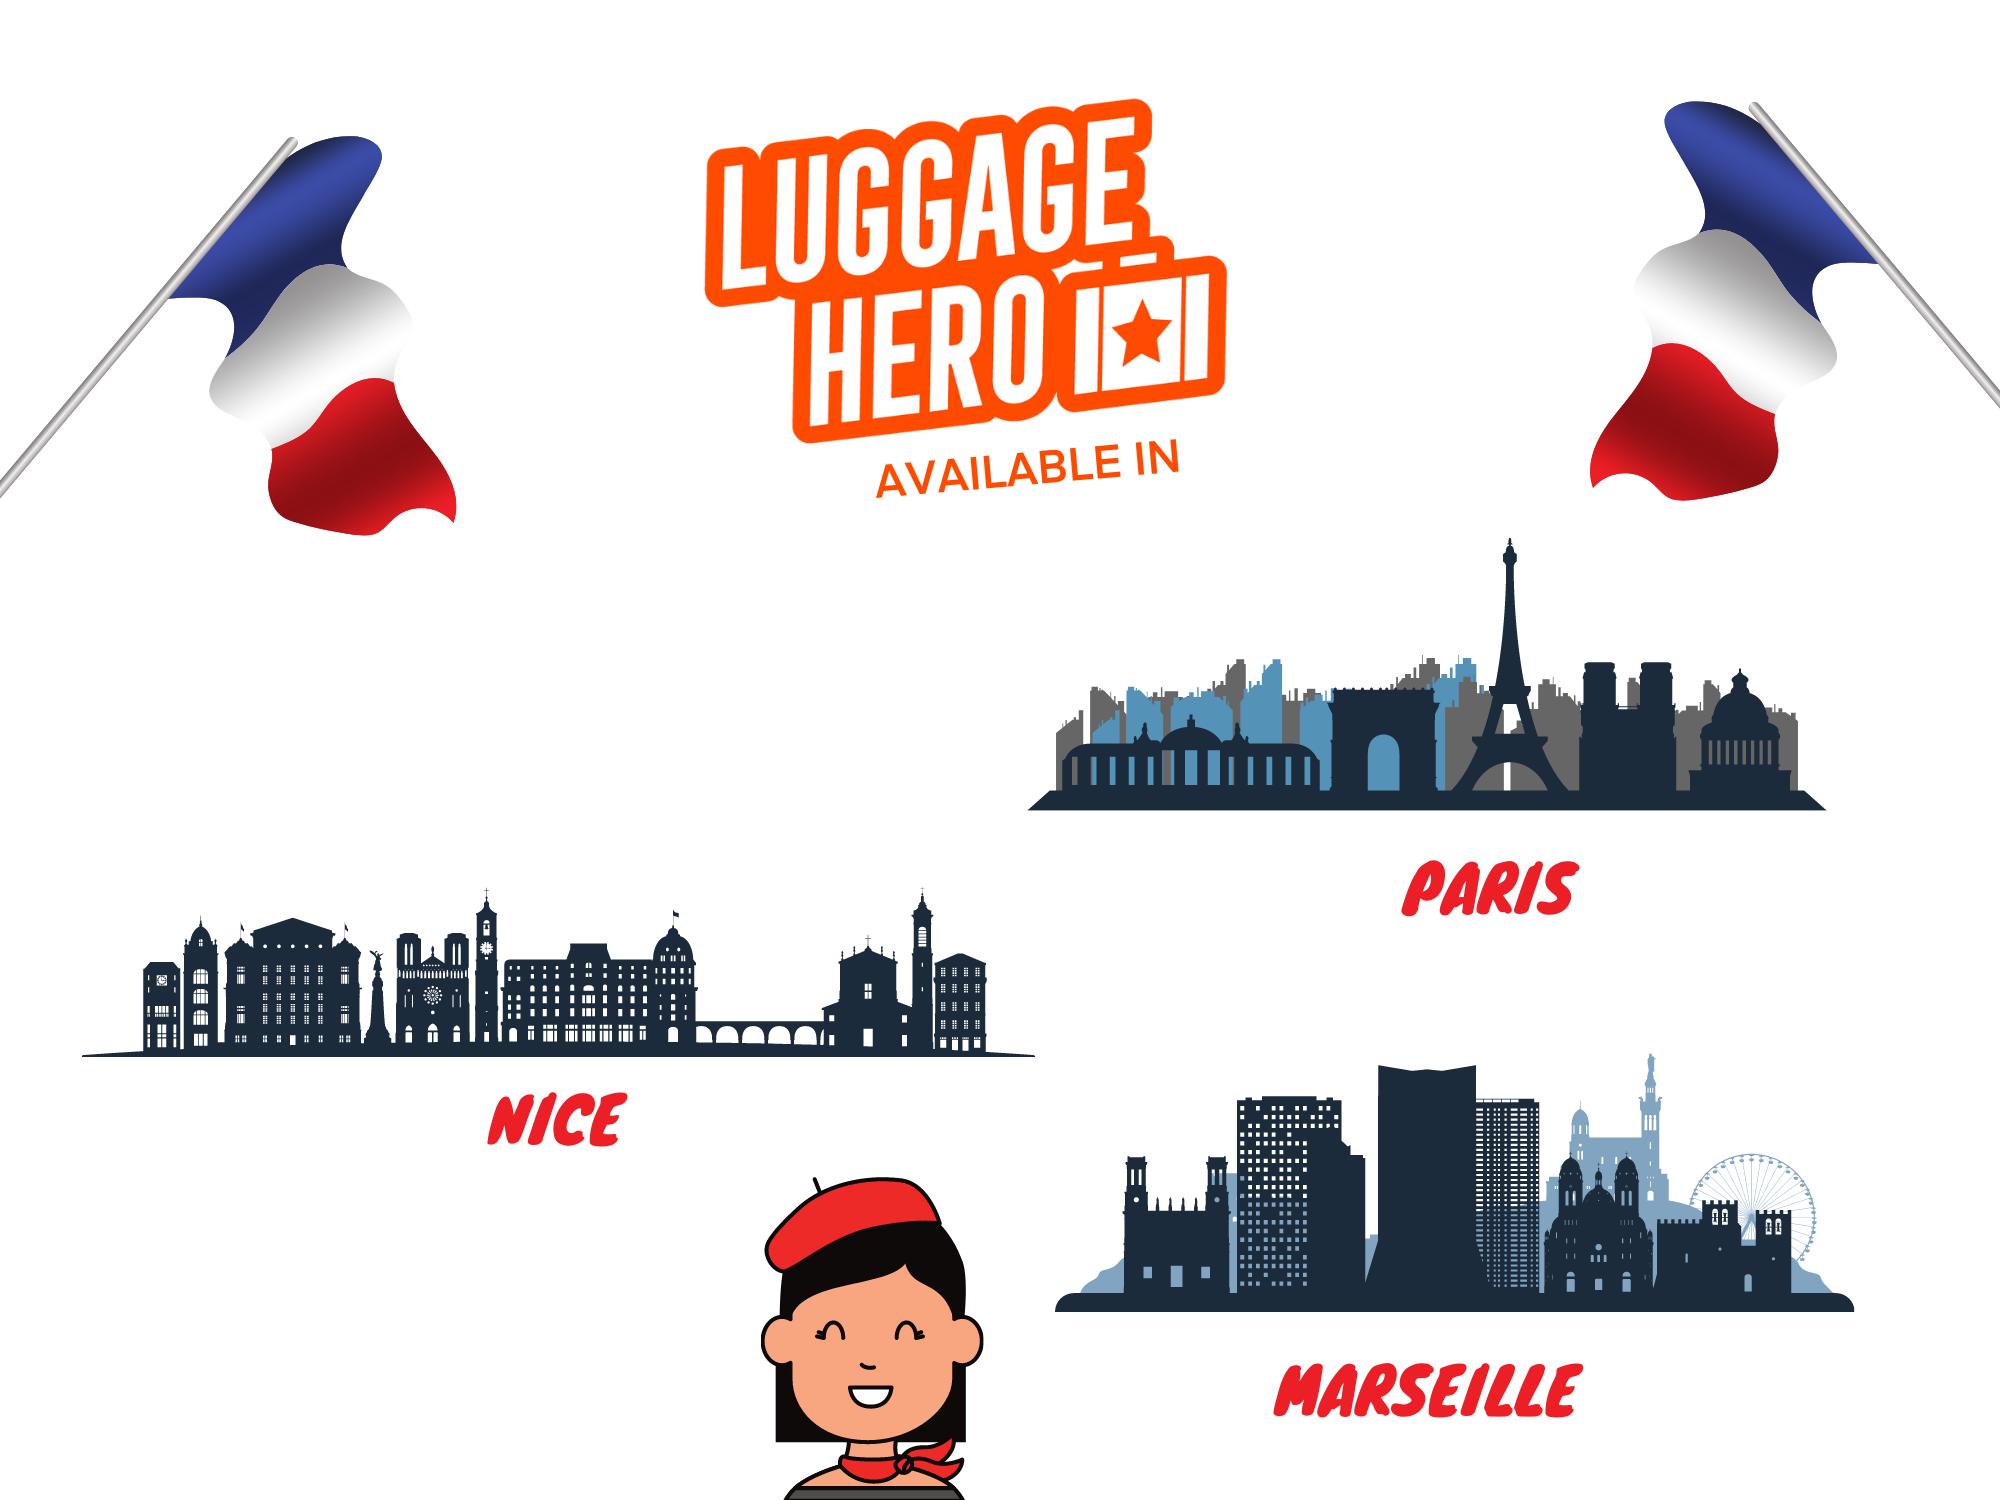 luggagehero in France